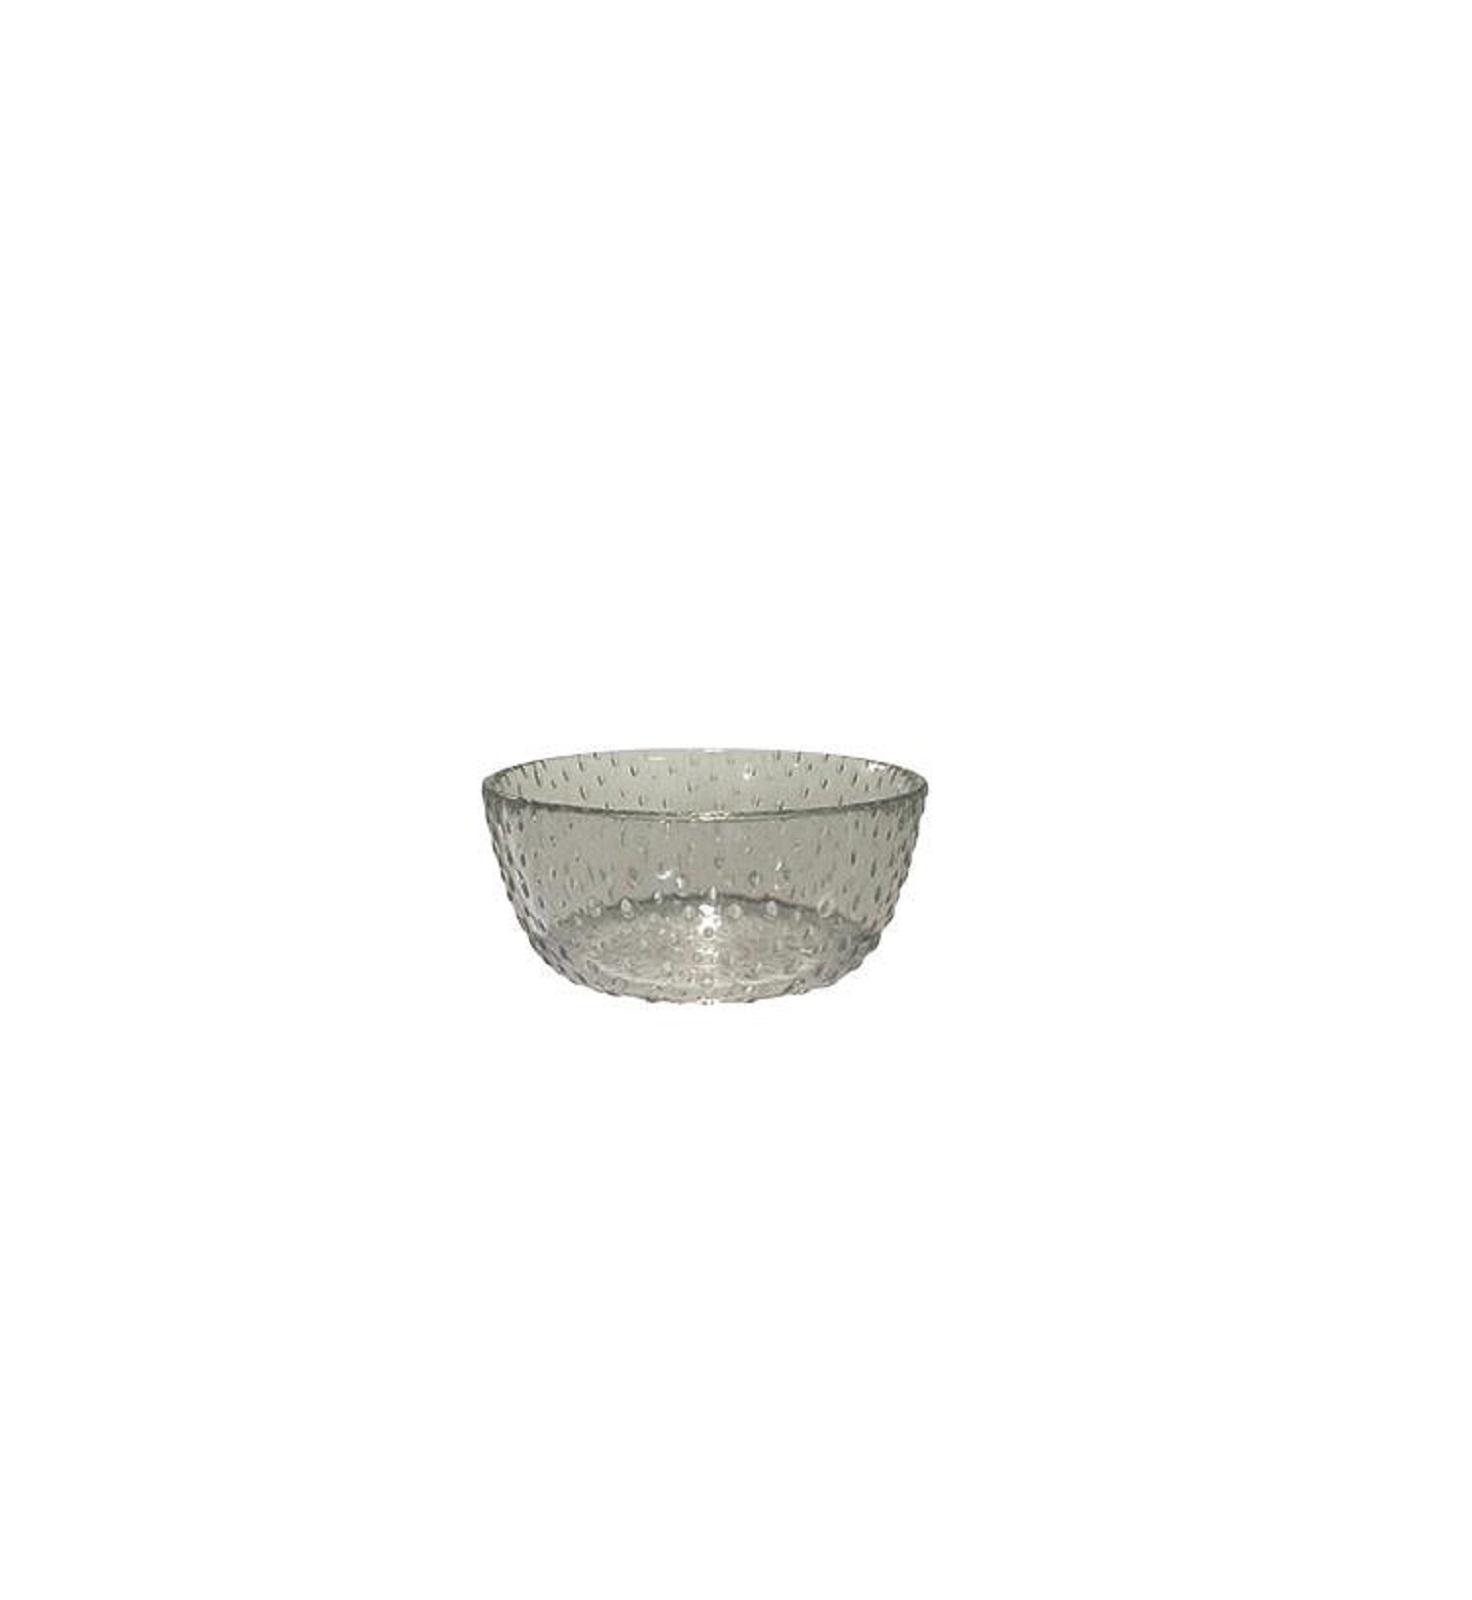 Онлайн каталог PROMENU: Пиала Aida RAW, диаметр 14 см, высота 6 см, прозрачный серый                               15062